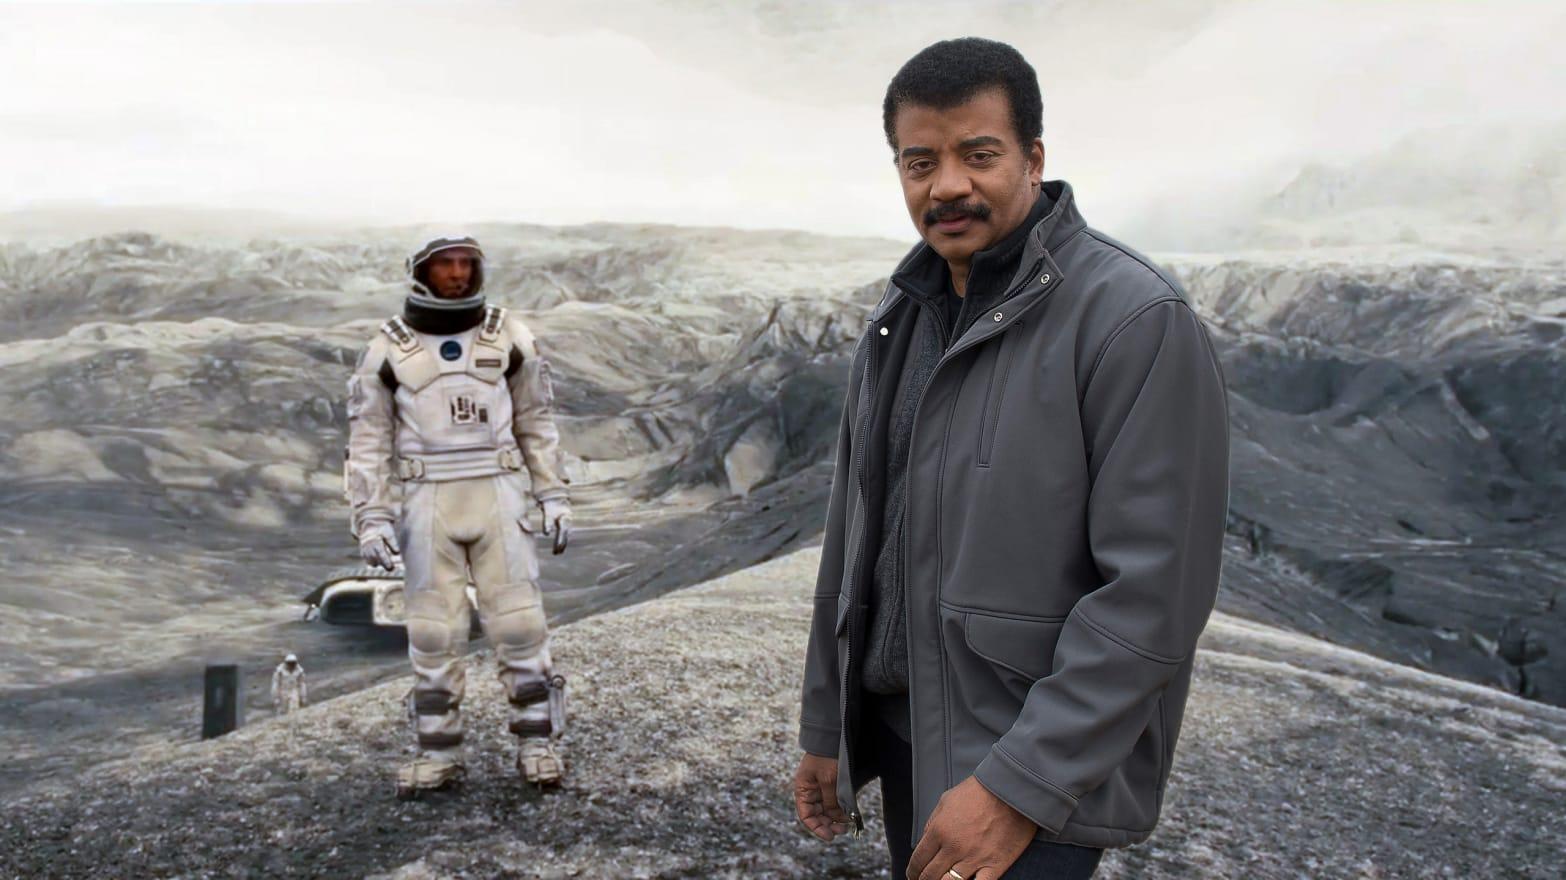 Neil deGrasse Tyson Breaks Down 'Interstellar': Black Holes, Time Dilations, and Massive Waves